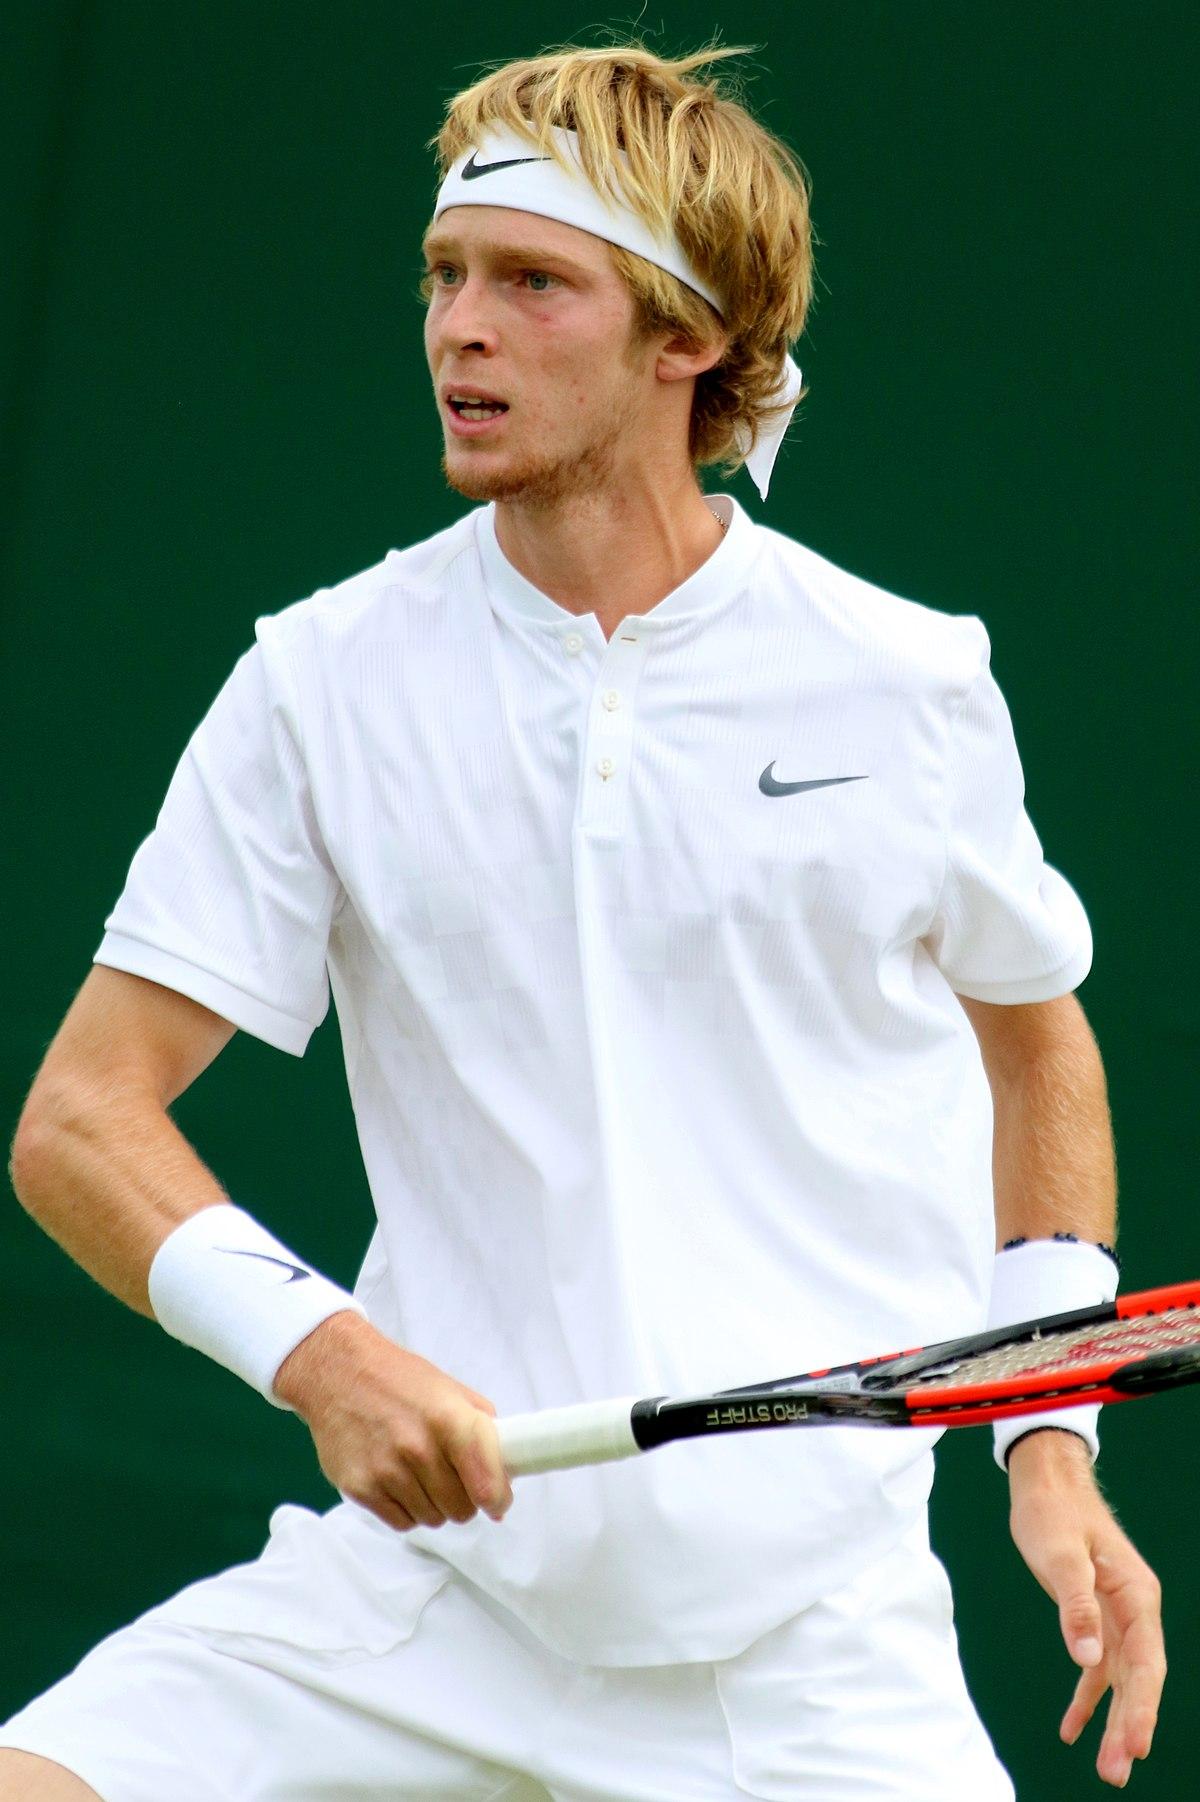 Andrey Rublev (tennis) - Wikipedia